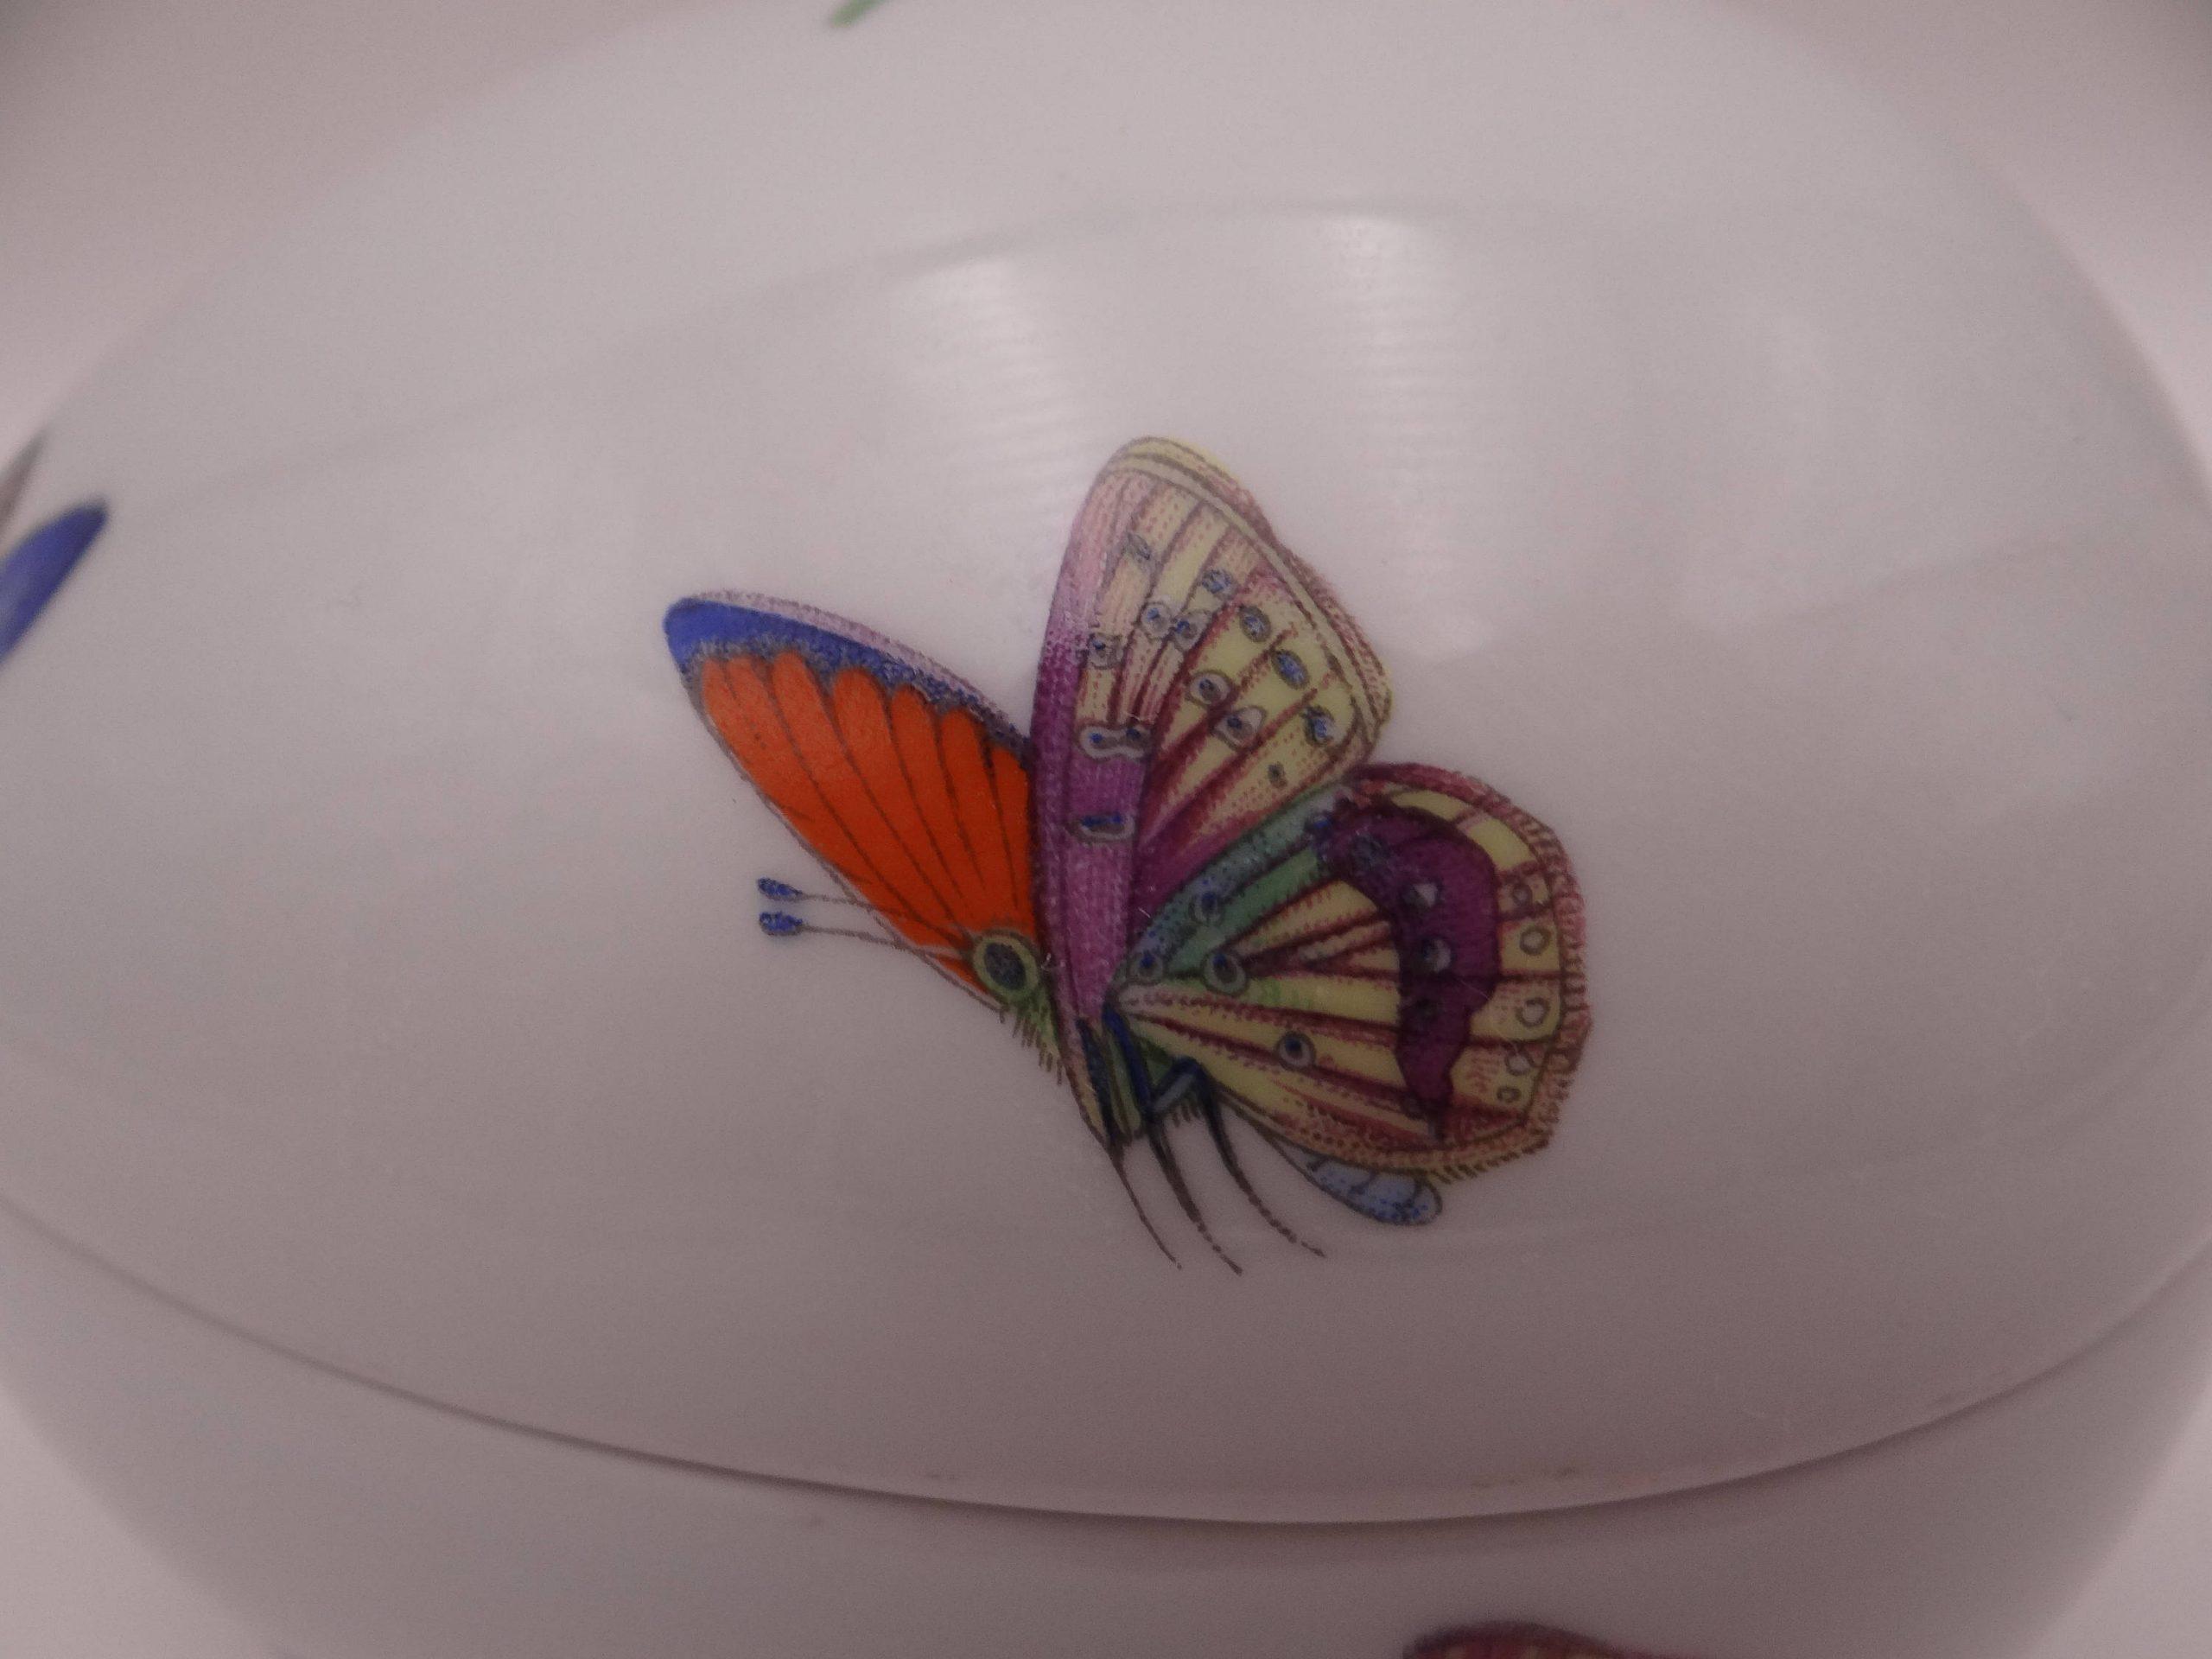 Zanzibar Jeweled Enamel Trinket Box Butterfly Hangzhou in Box